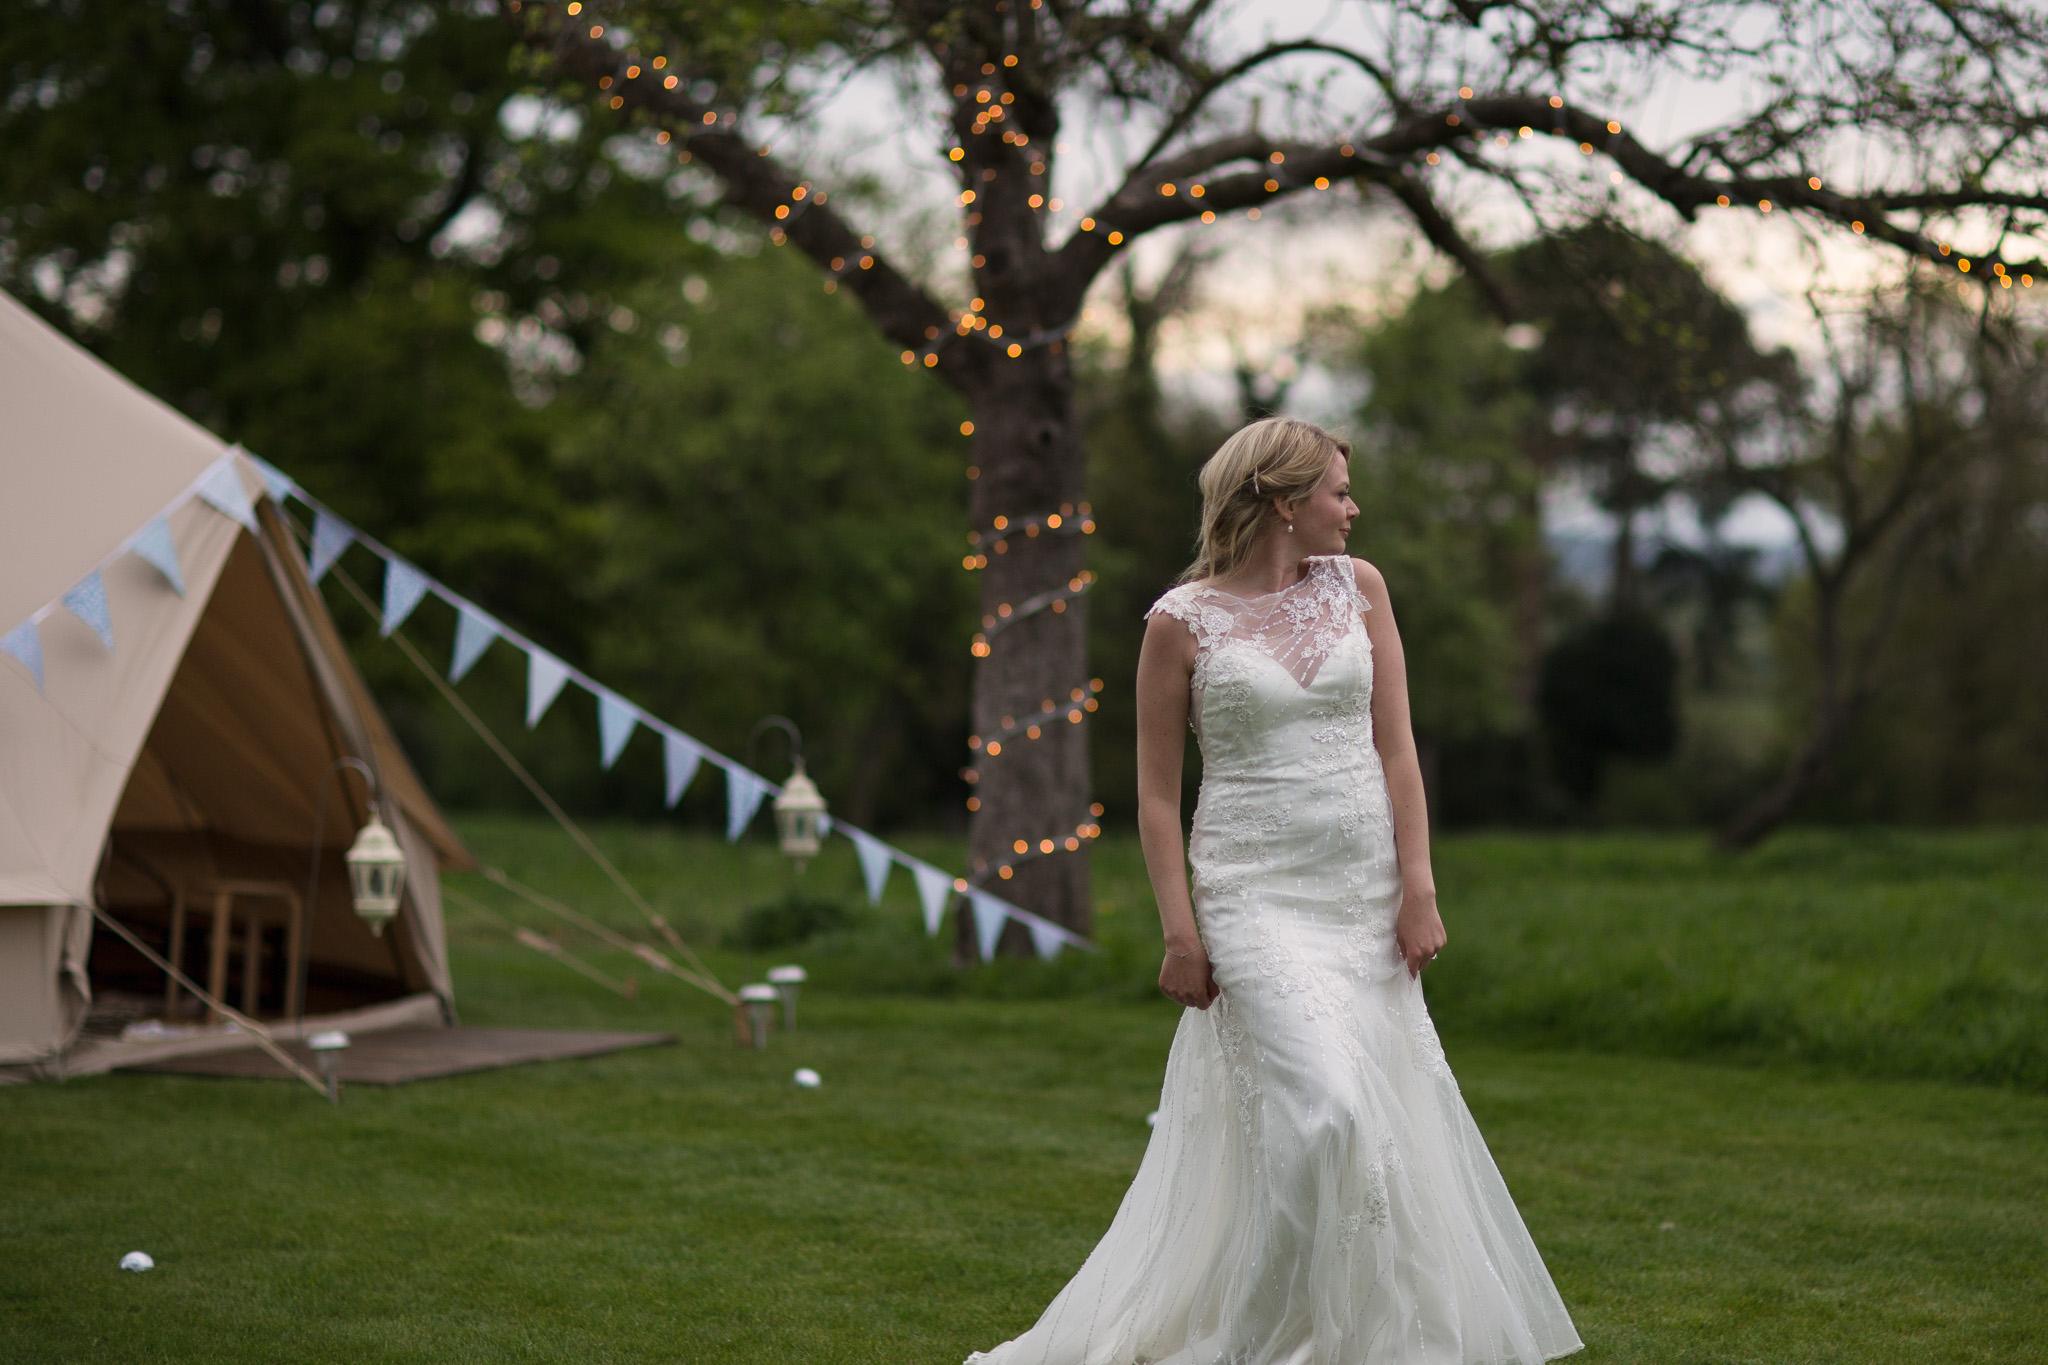 Mark_Barnes_Gloucester_Wedding_Photographer_Elmore_Court_Wedding_Photography_Mike+Kelly-88.jpg